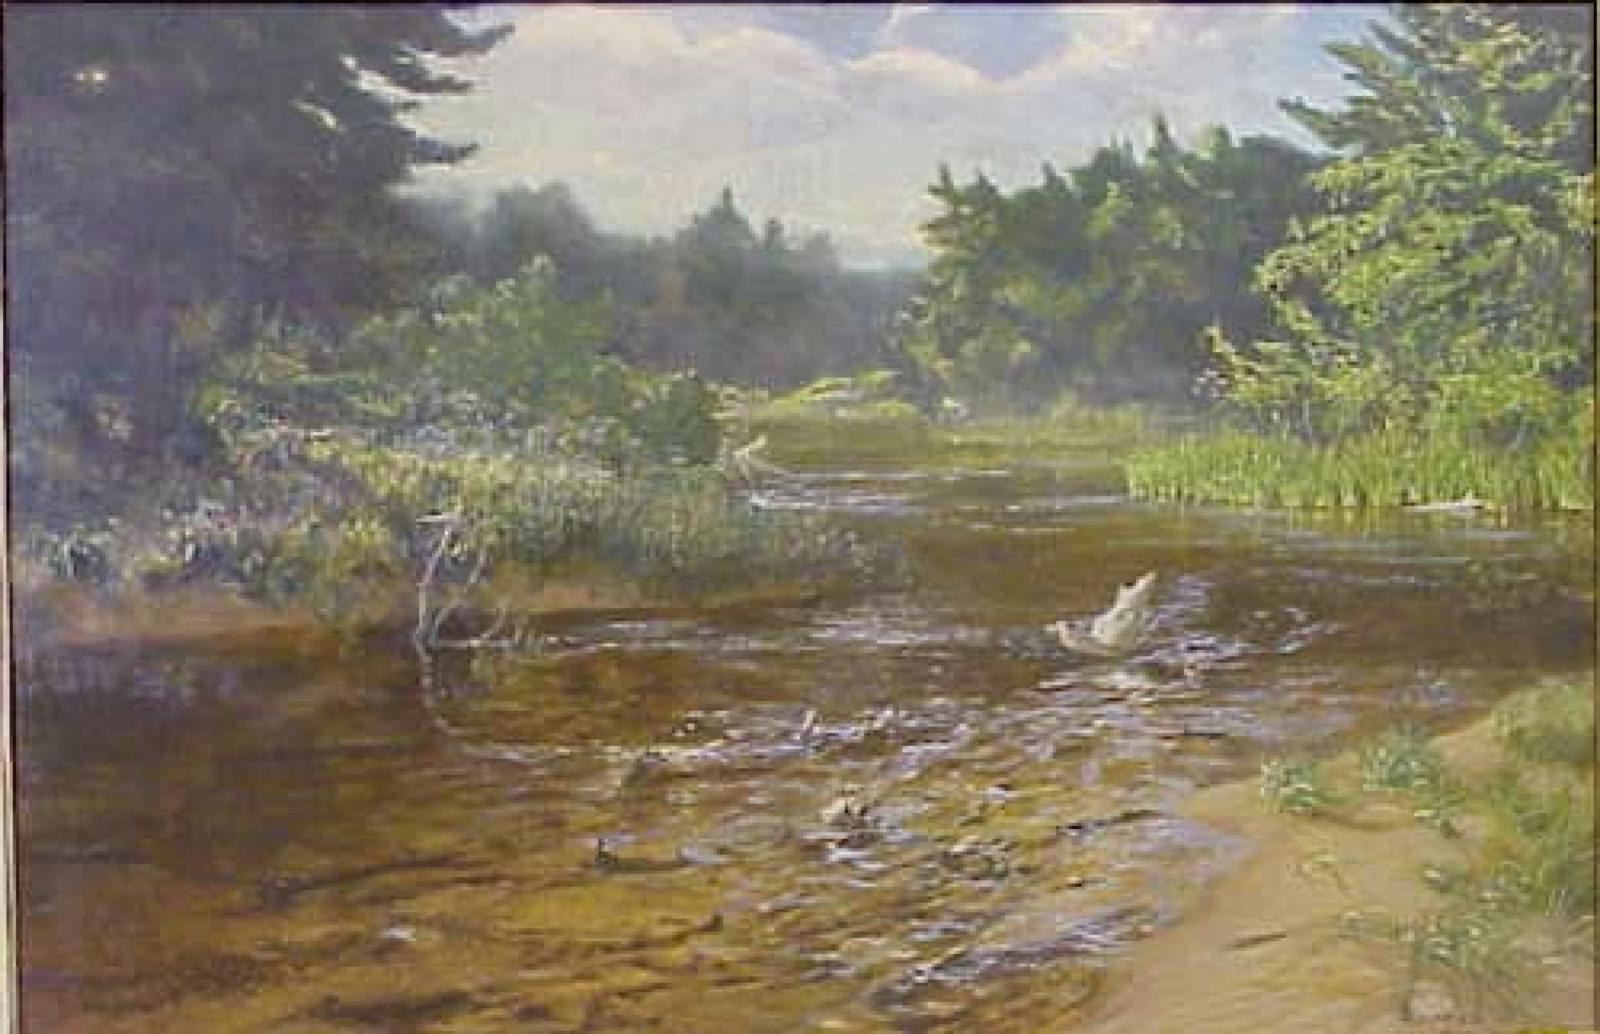 Landscape of a Michigan river.